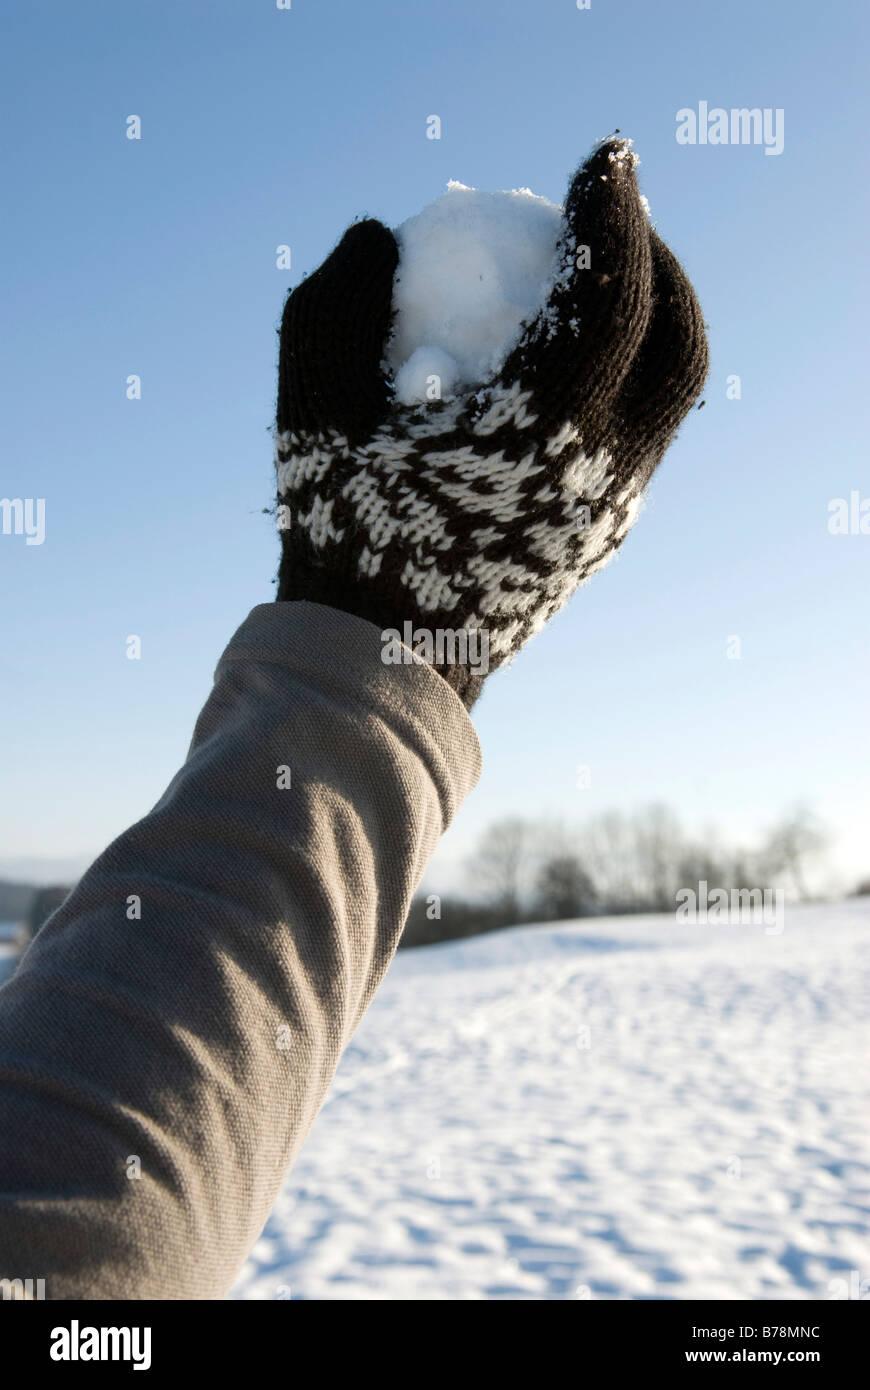 Human hand holding snowball, close-up - Stock Image